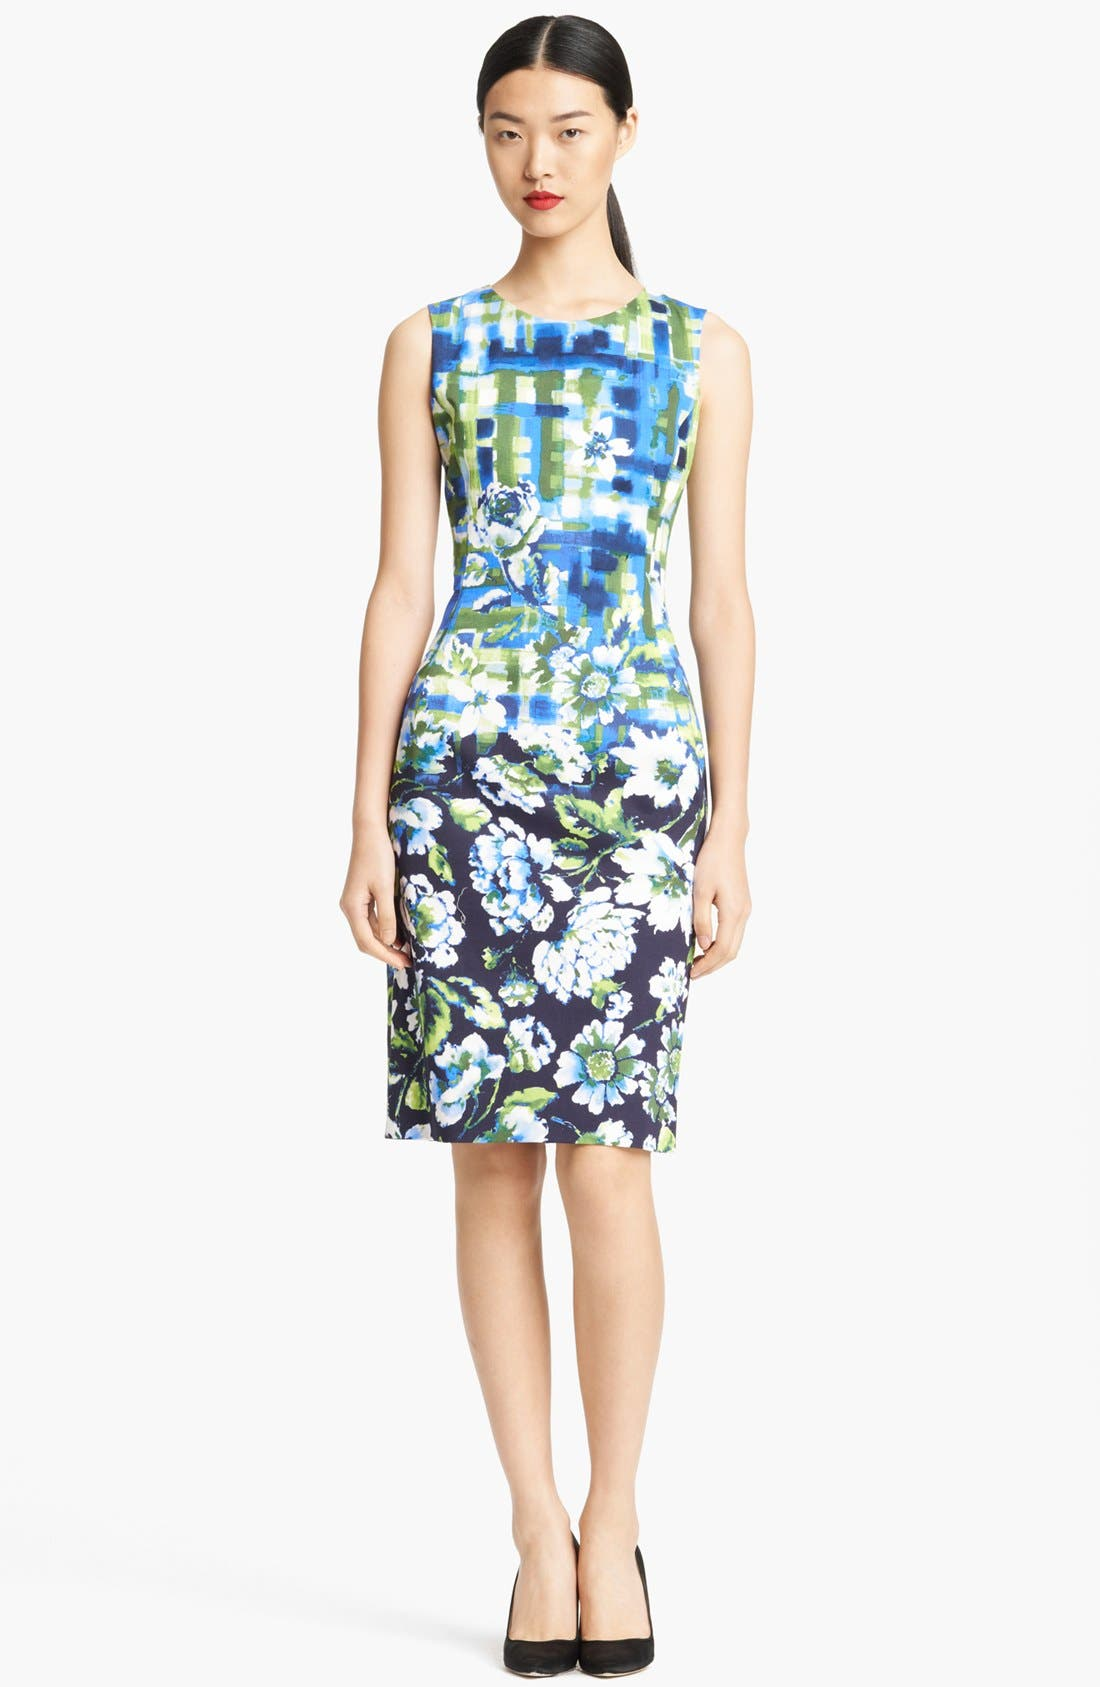 Alternate Image 1 Selected - Oscar de la Renta Painted Floral Print Sheath Dress